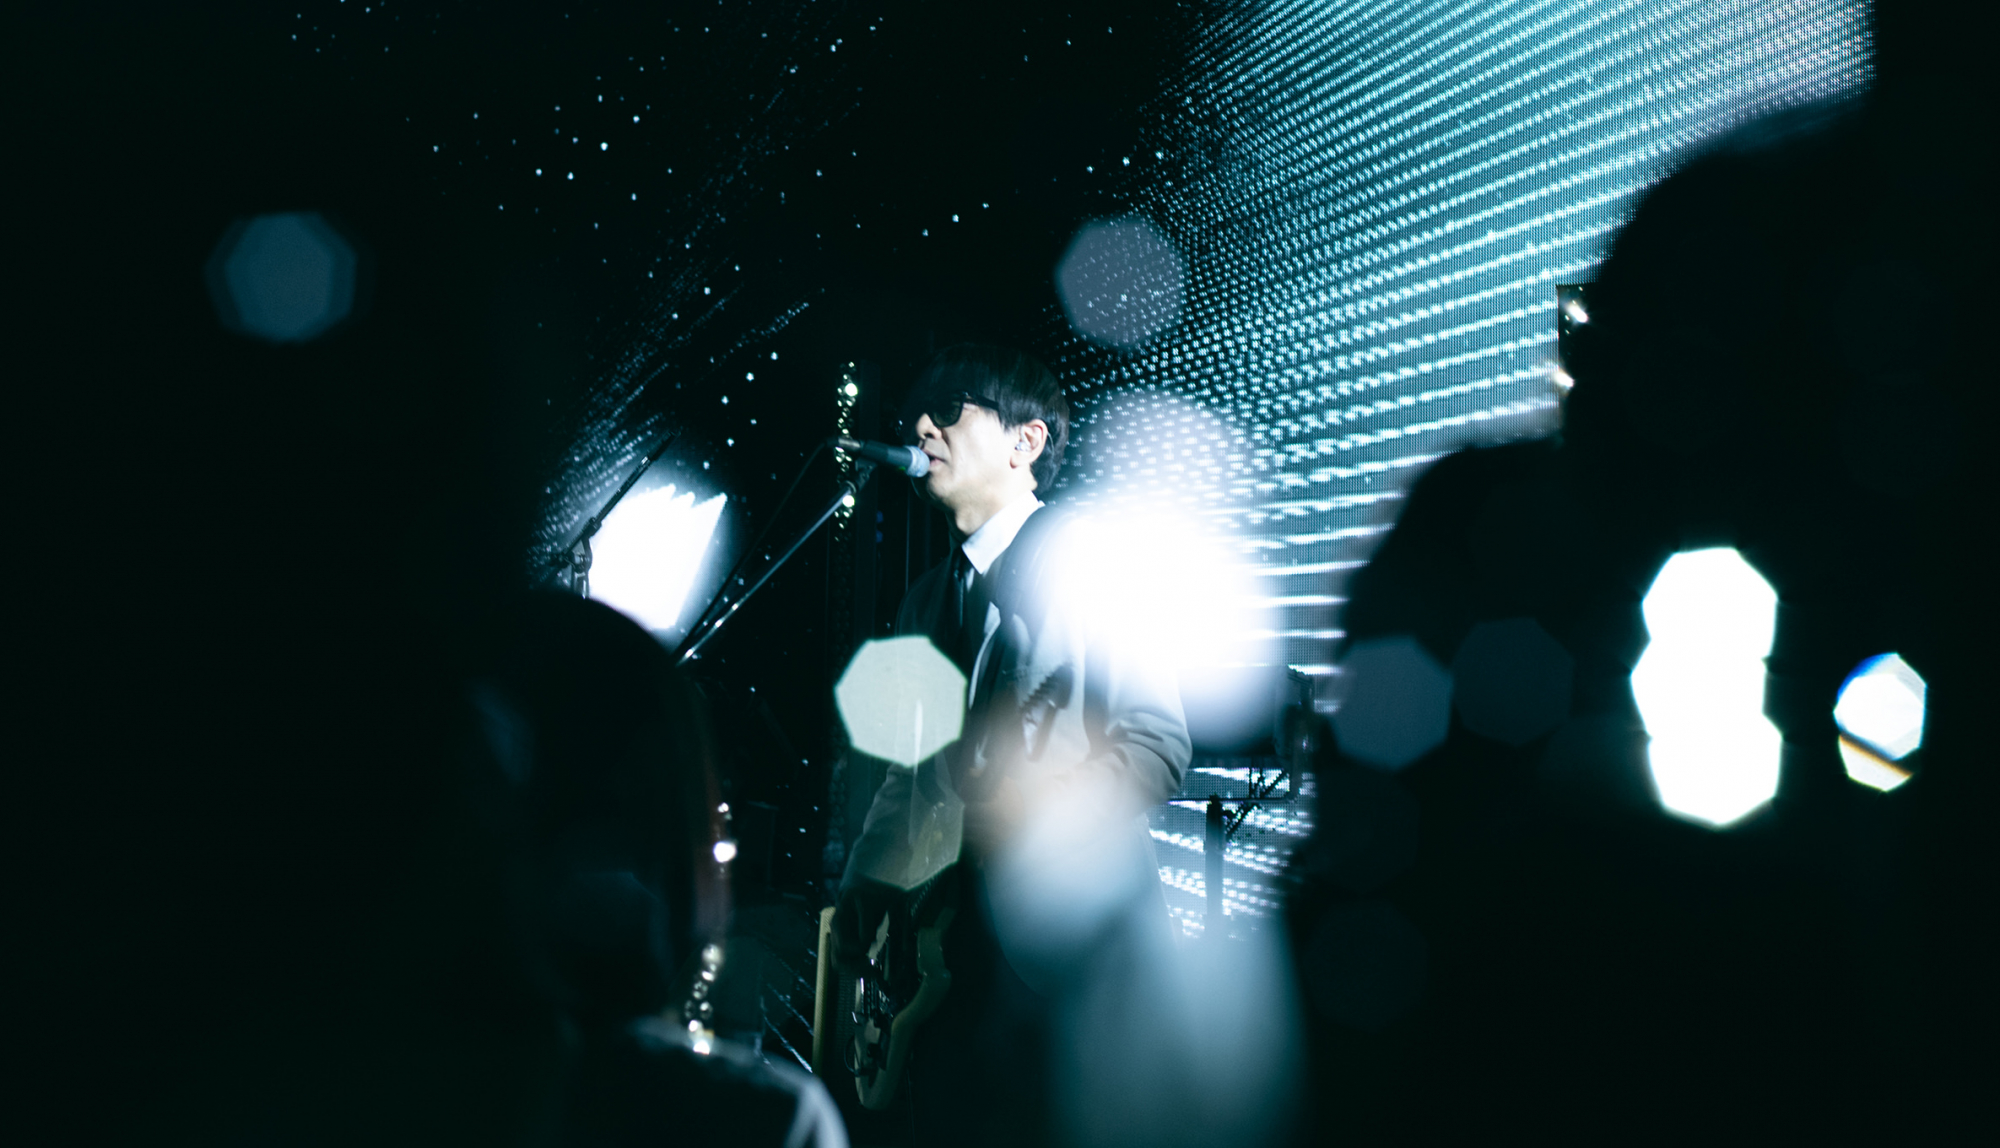 """CORNELIUS live show case""SHIBUYA PARCO sound check 1.2""secret live photo公开"""